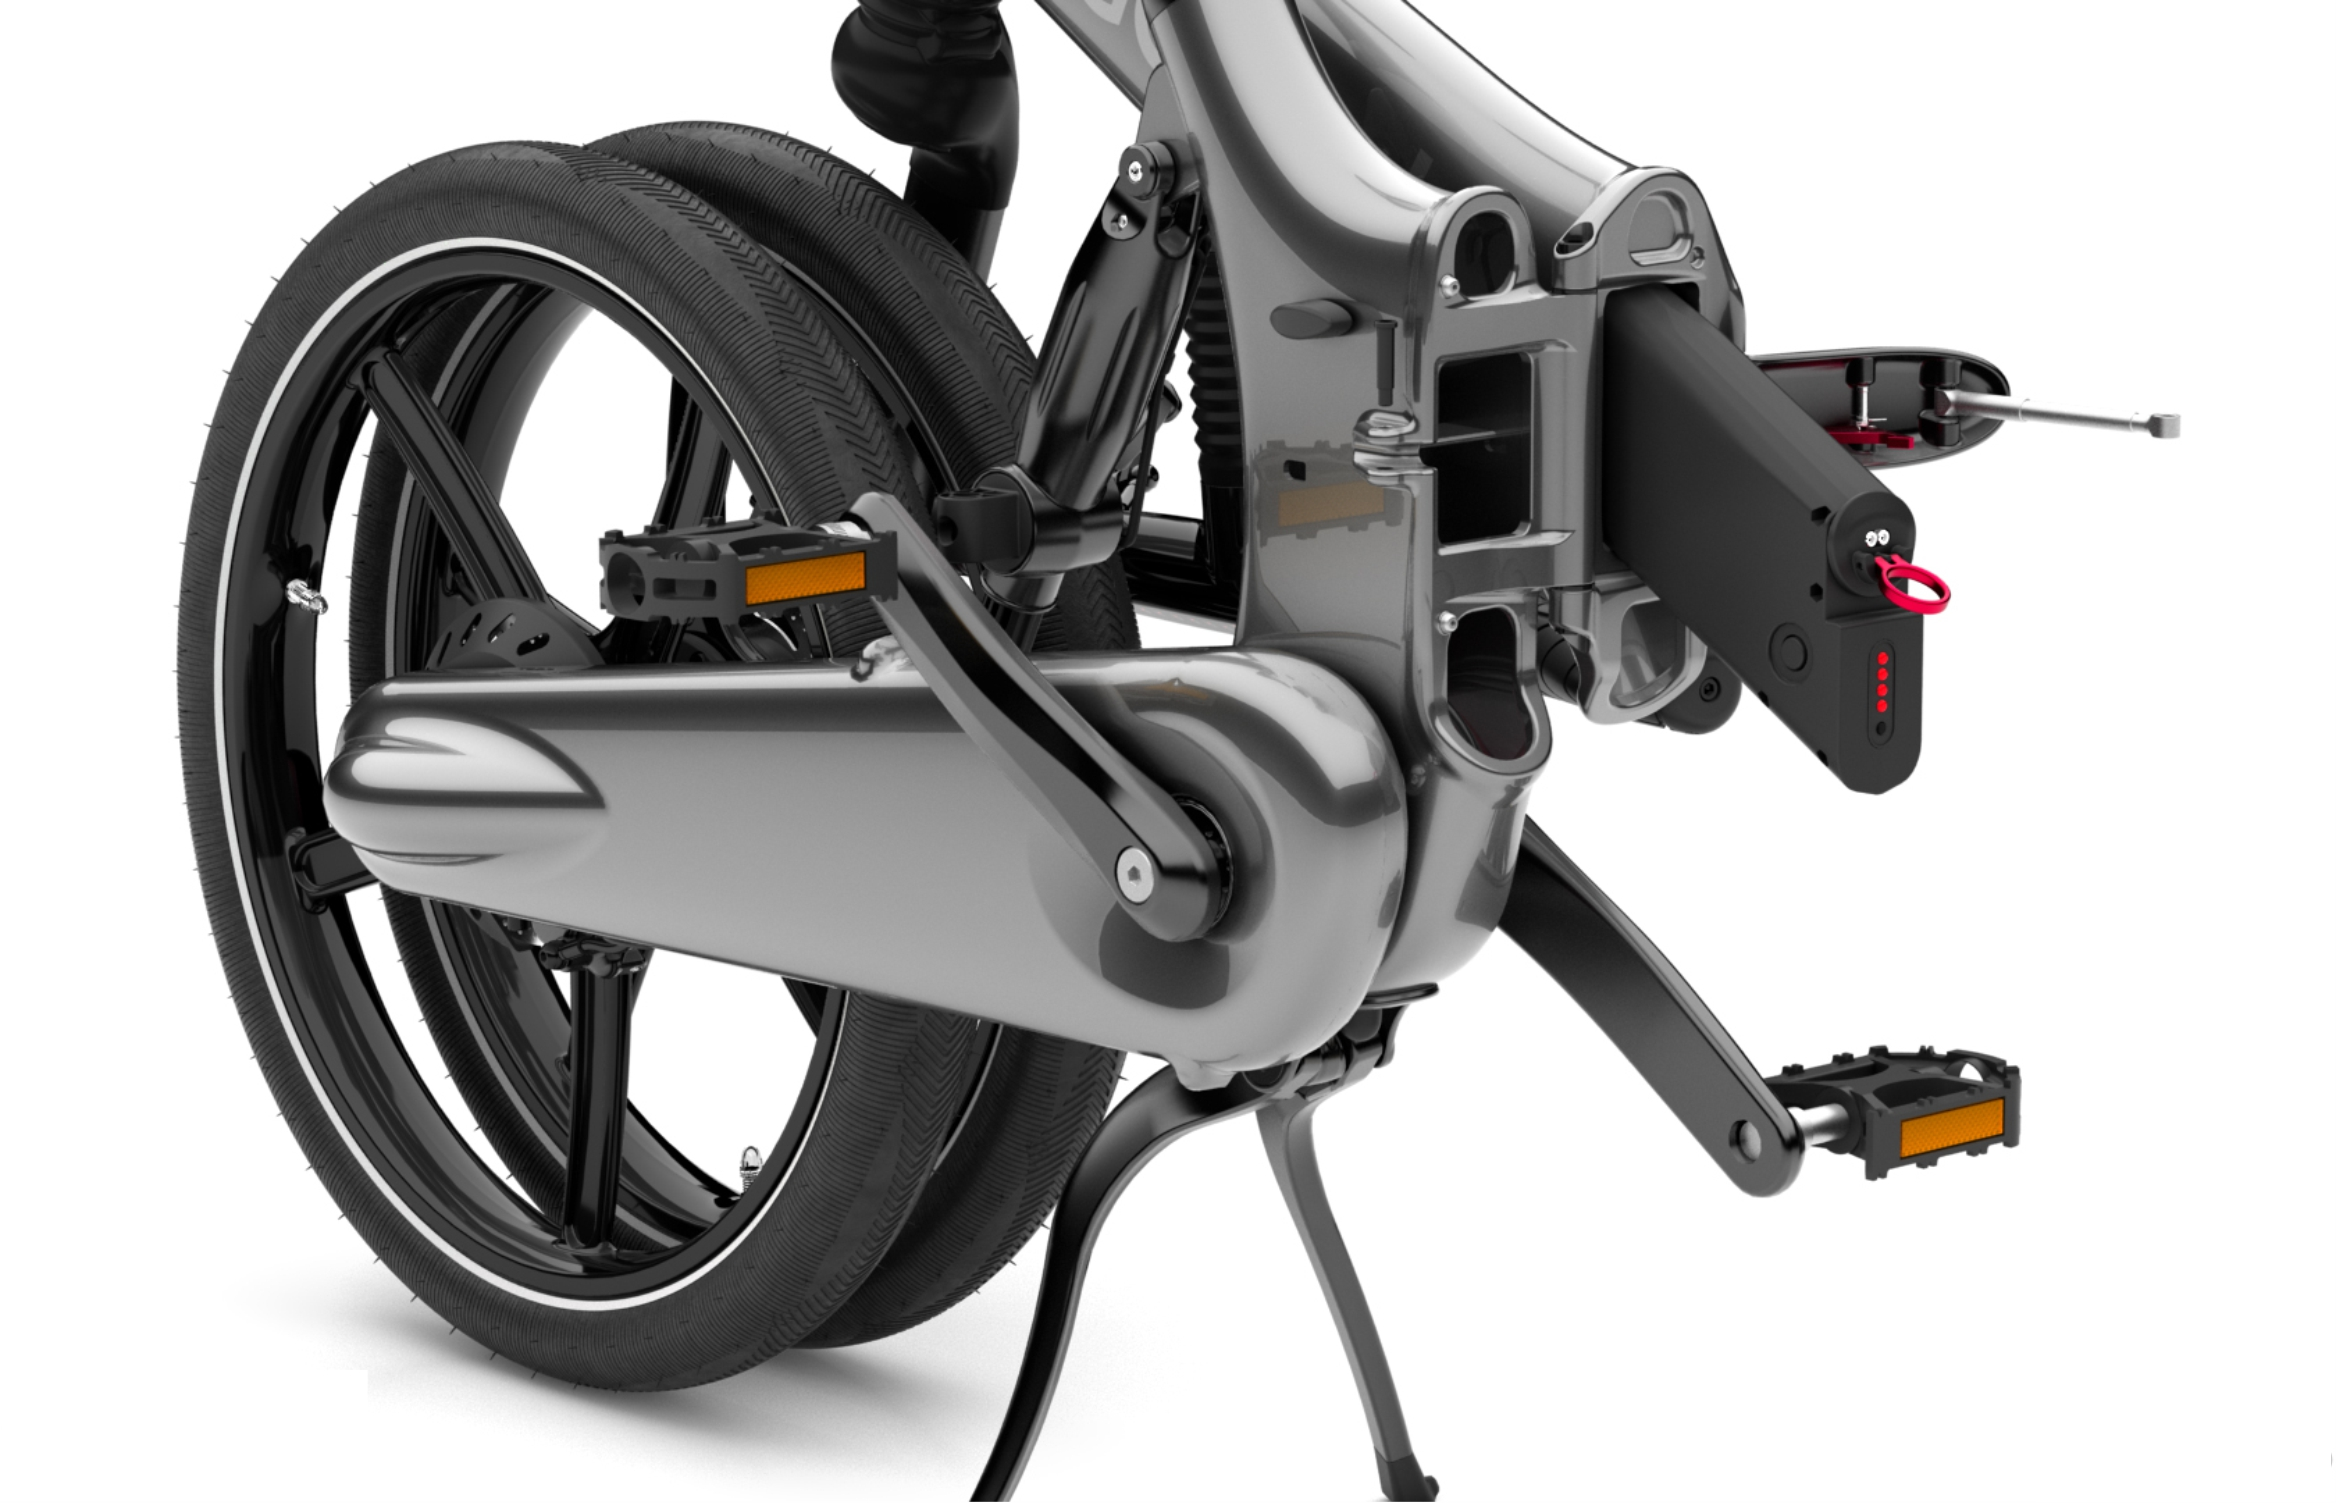 Gocycle G3 Kickstand nosilec